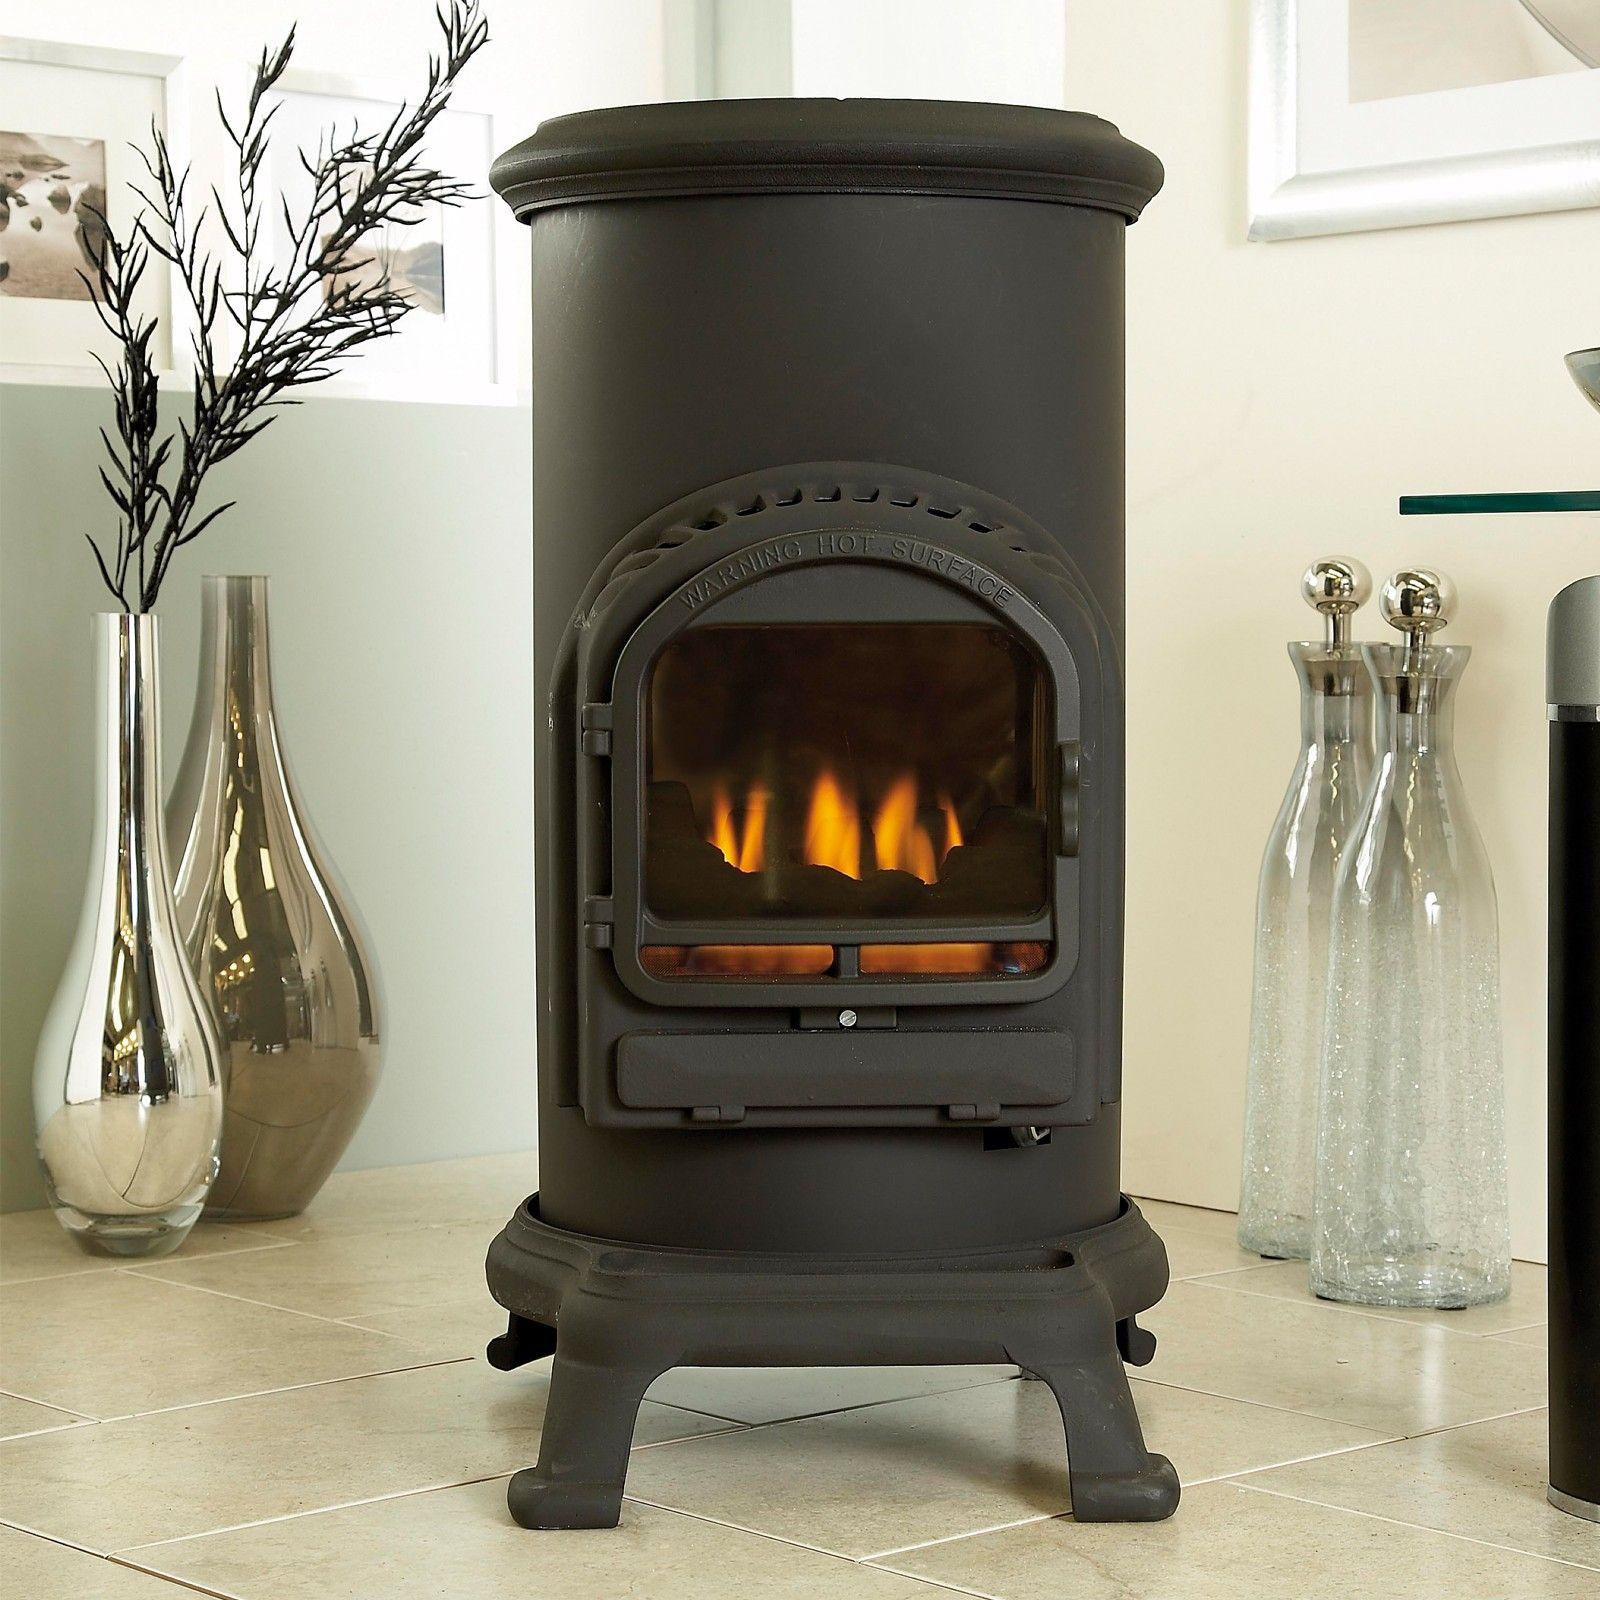 Portable Gas Fireplace Heater Fireplace Pinterest